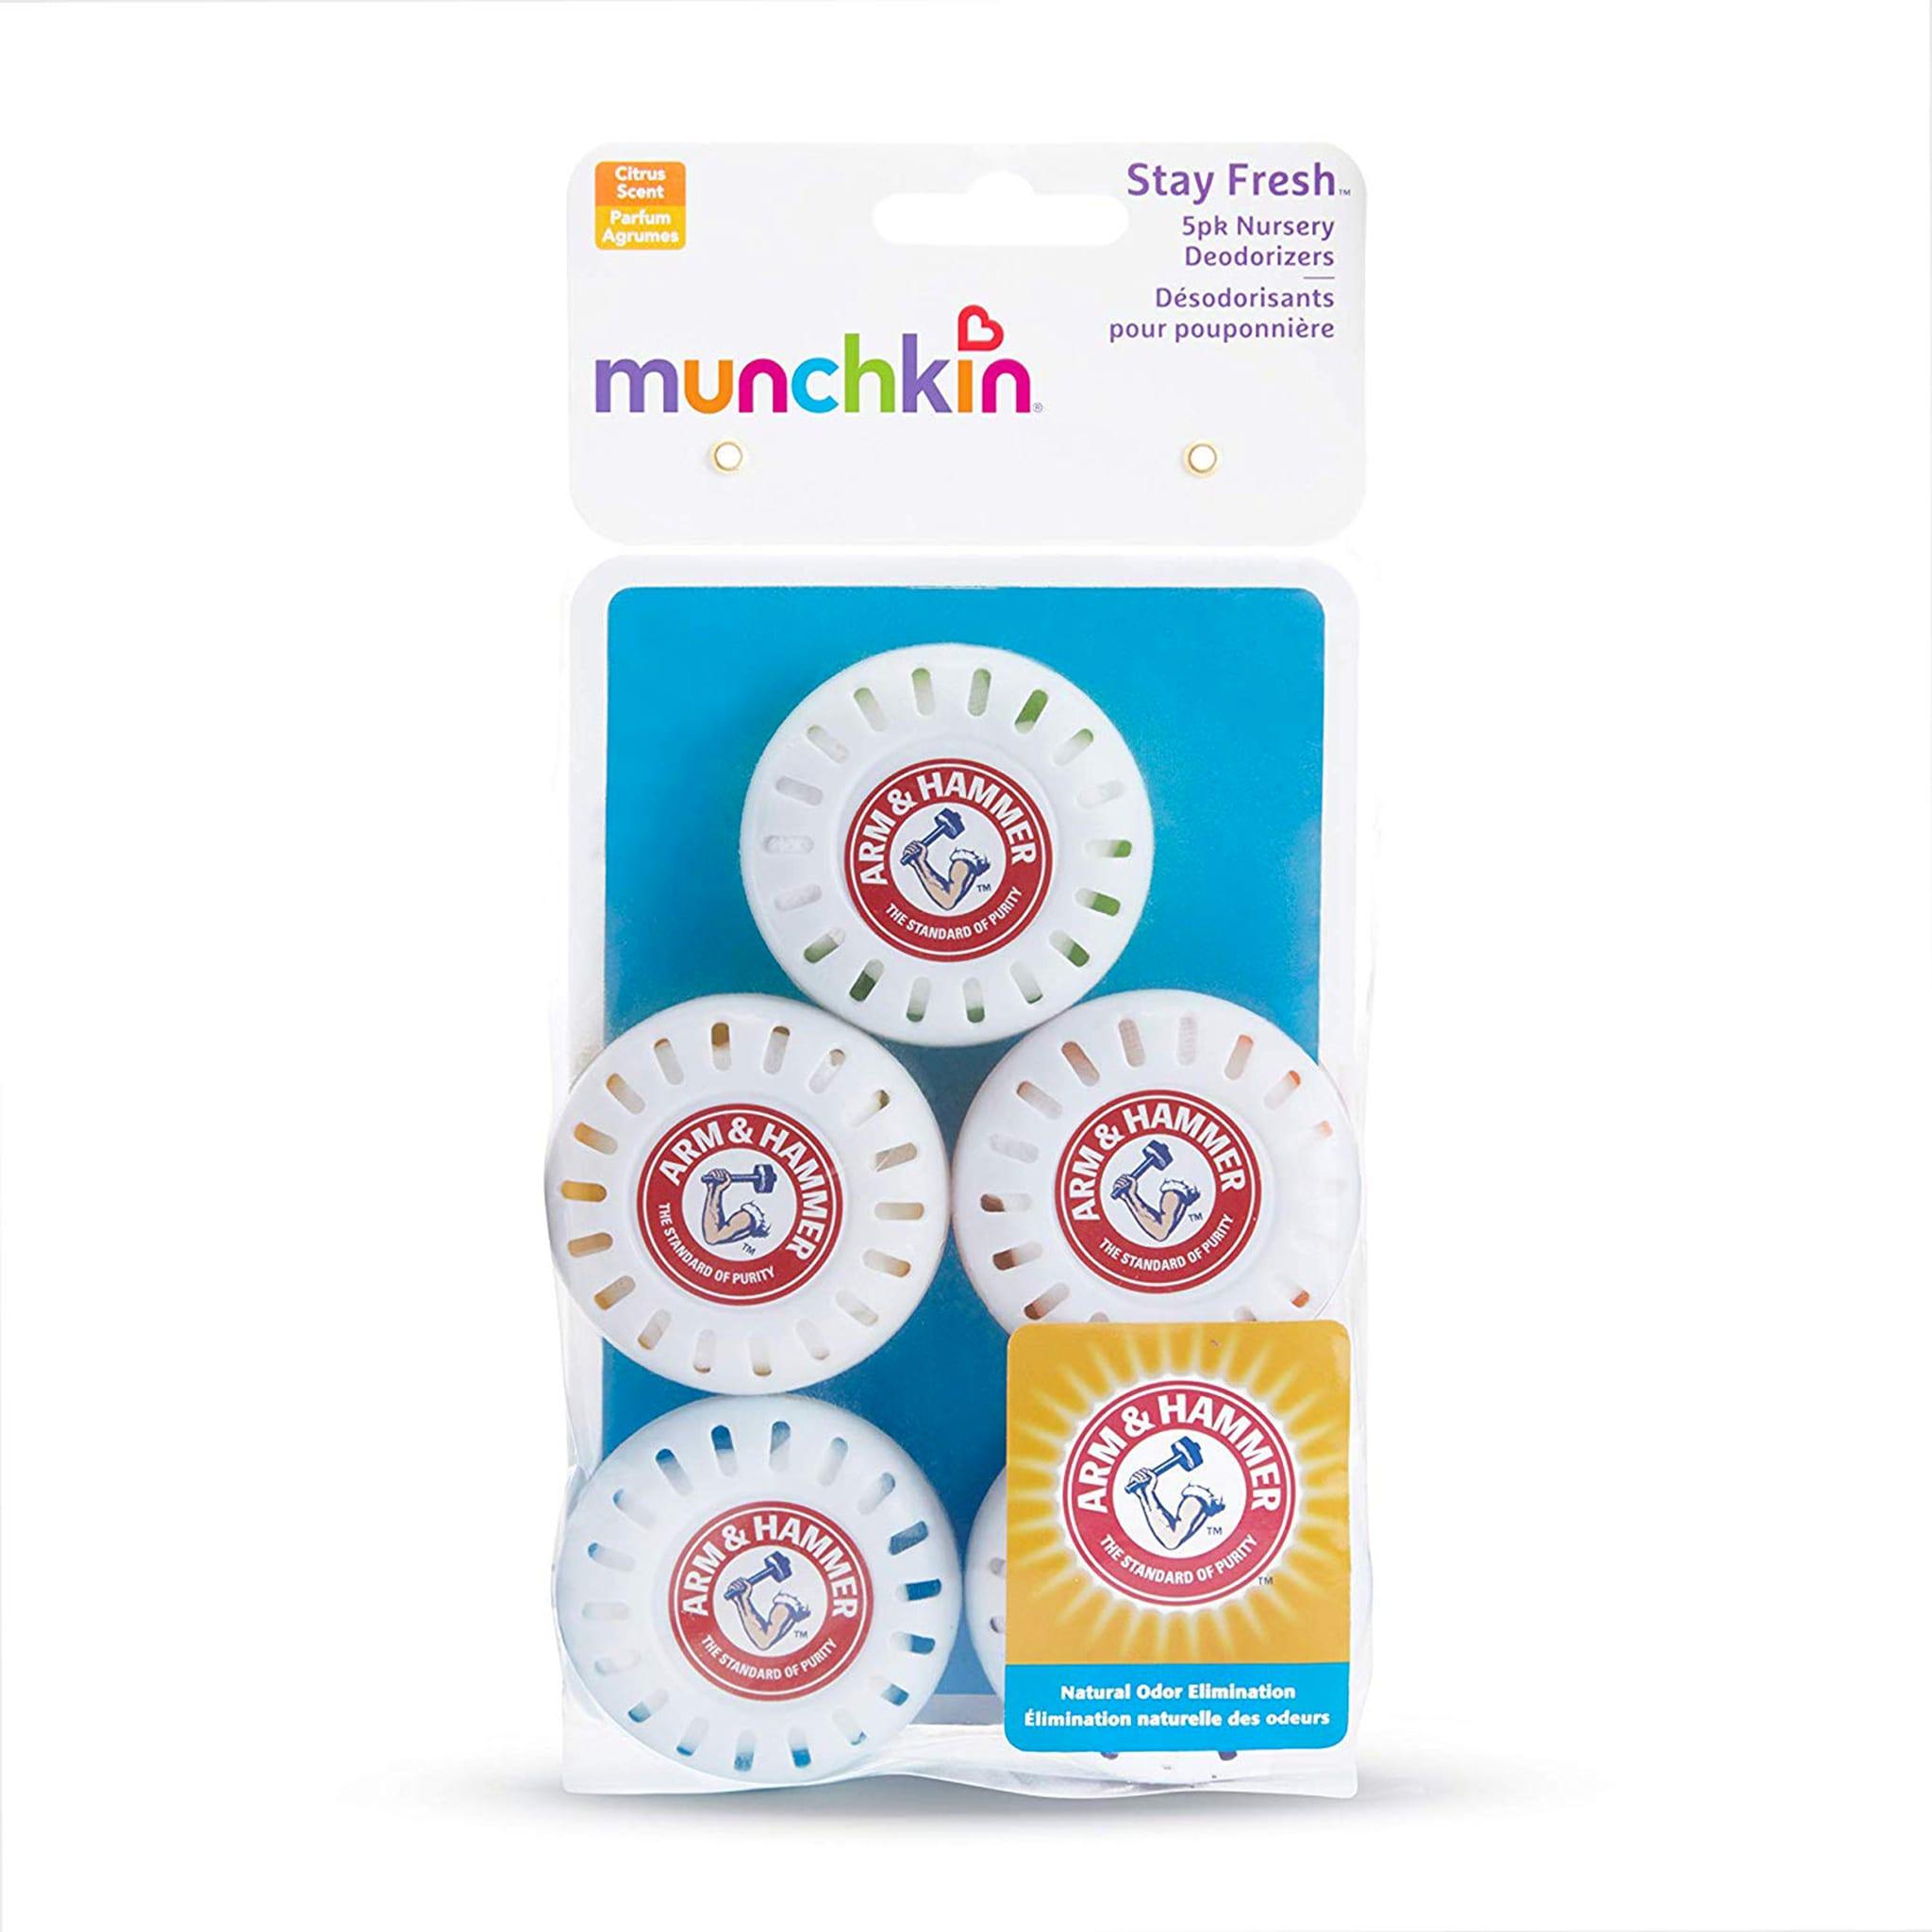 2 Pack Munchkin Arm /& Hammer Deodorizer Fresheners Lavender or Citrus 5 Ct Each